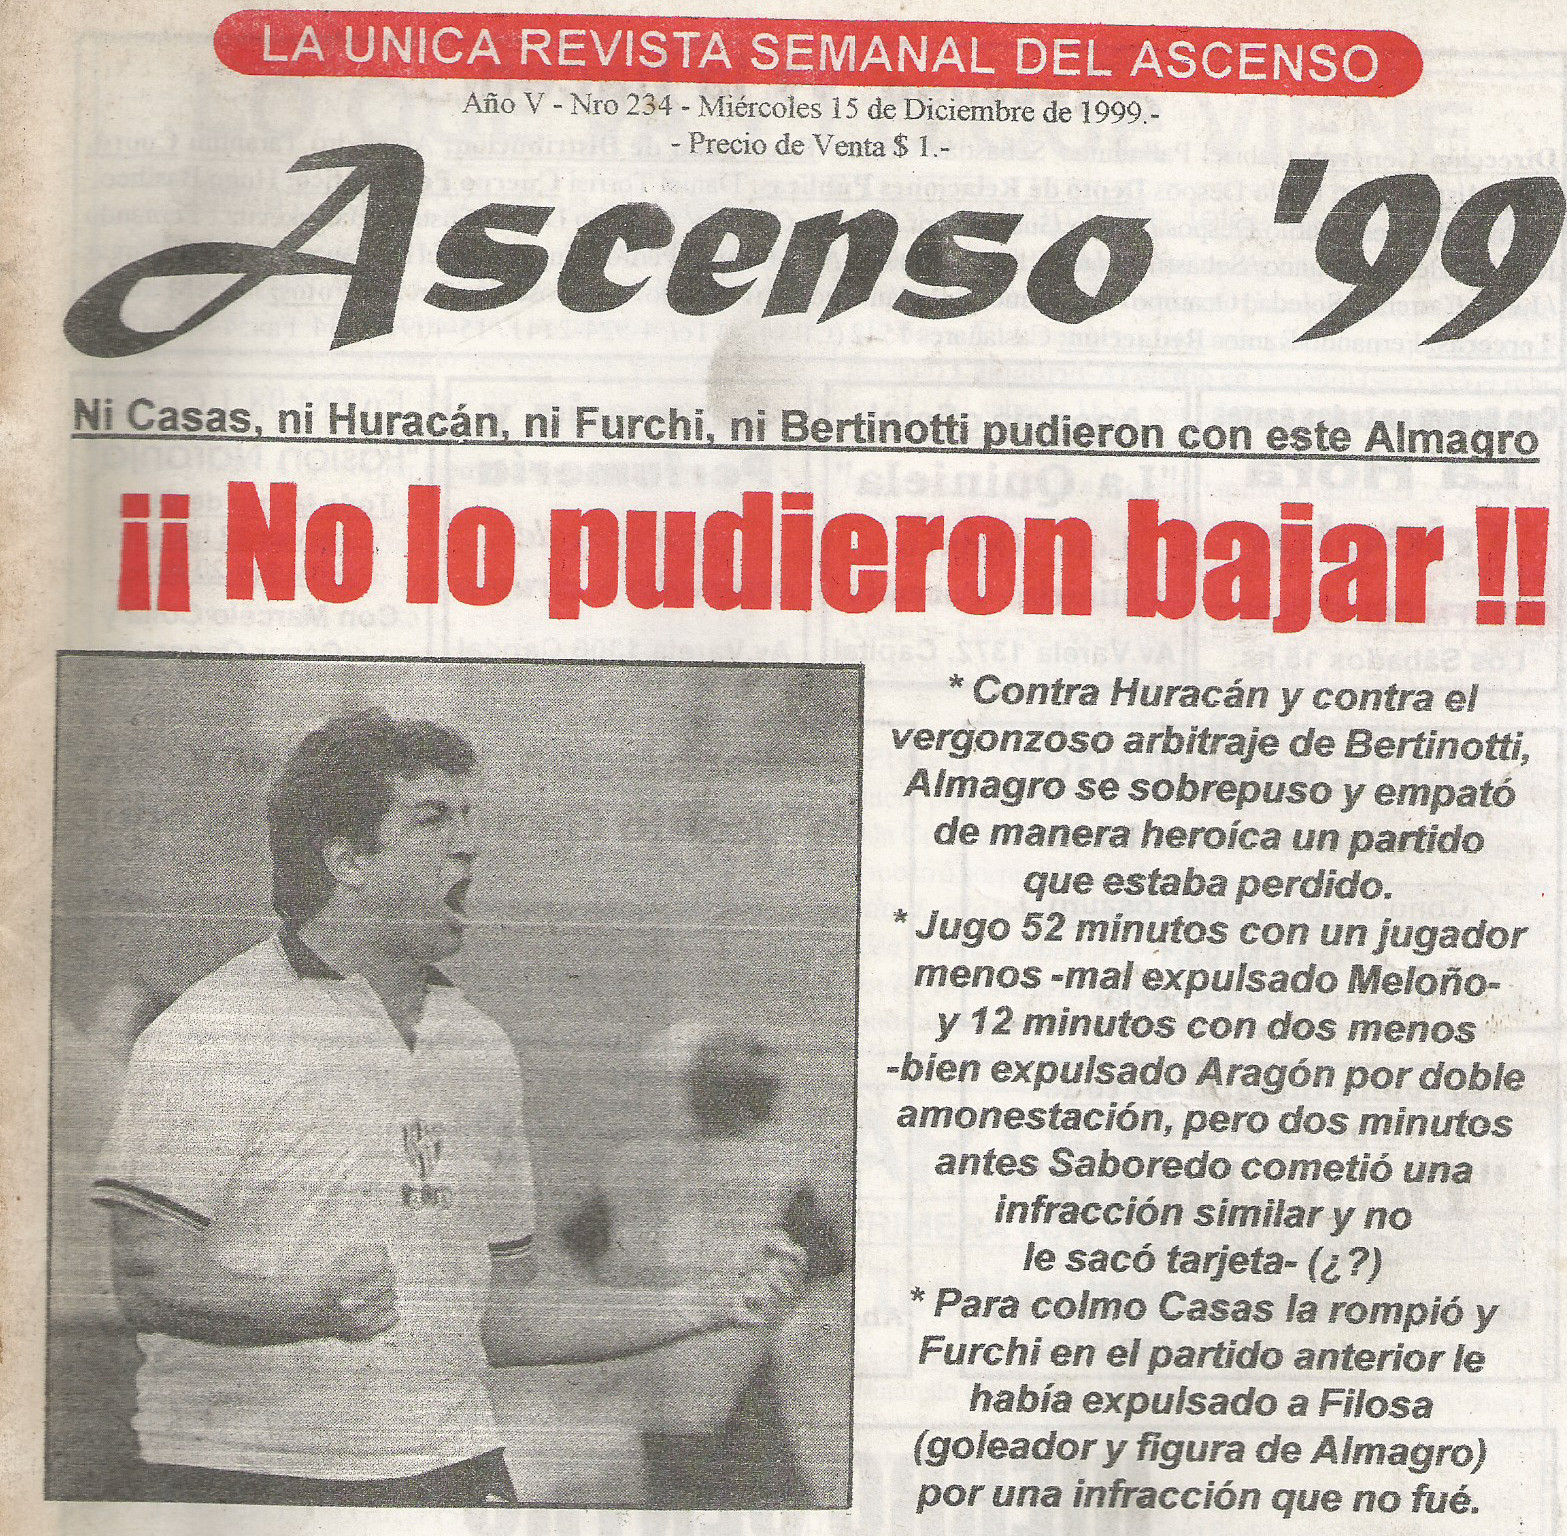 99-2000 NACIONAL B - HURACAN - ALMAGRO - ASCENSO99